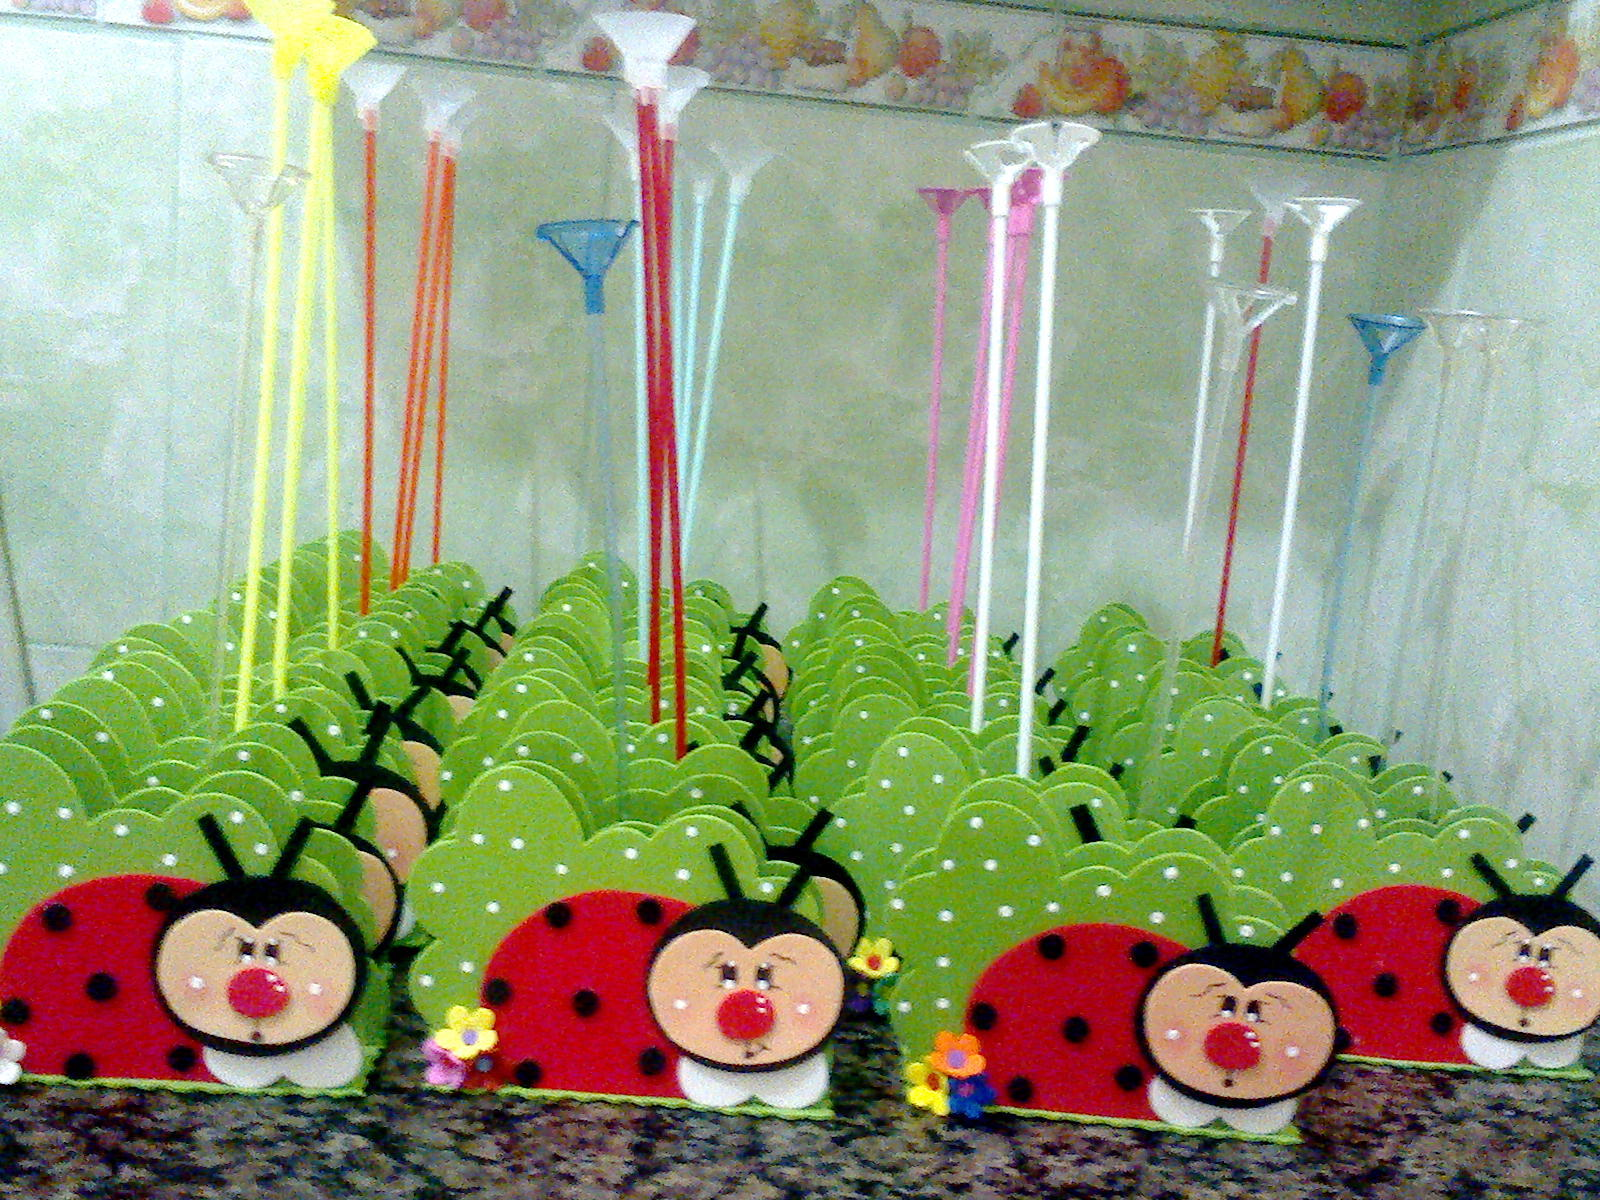 decoracao de festa infantil jardim das joaninhas:porta guardanapo joaninha festa infantil porta guardanapo joaninha